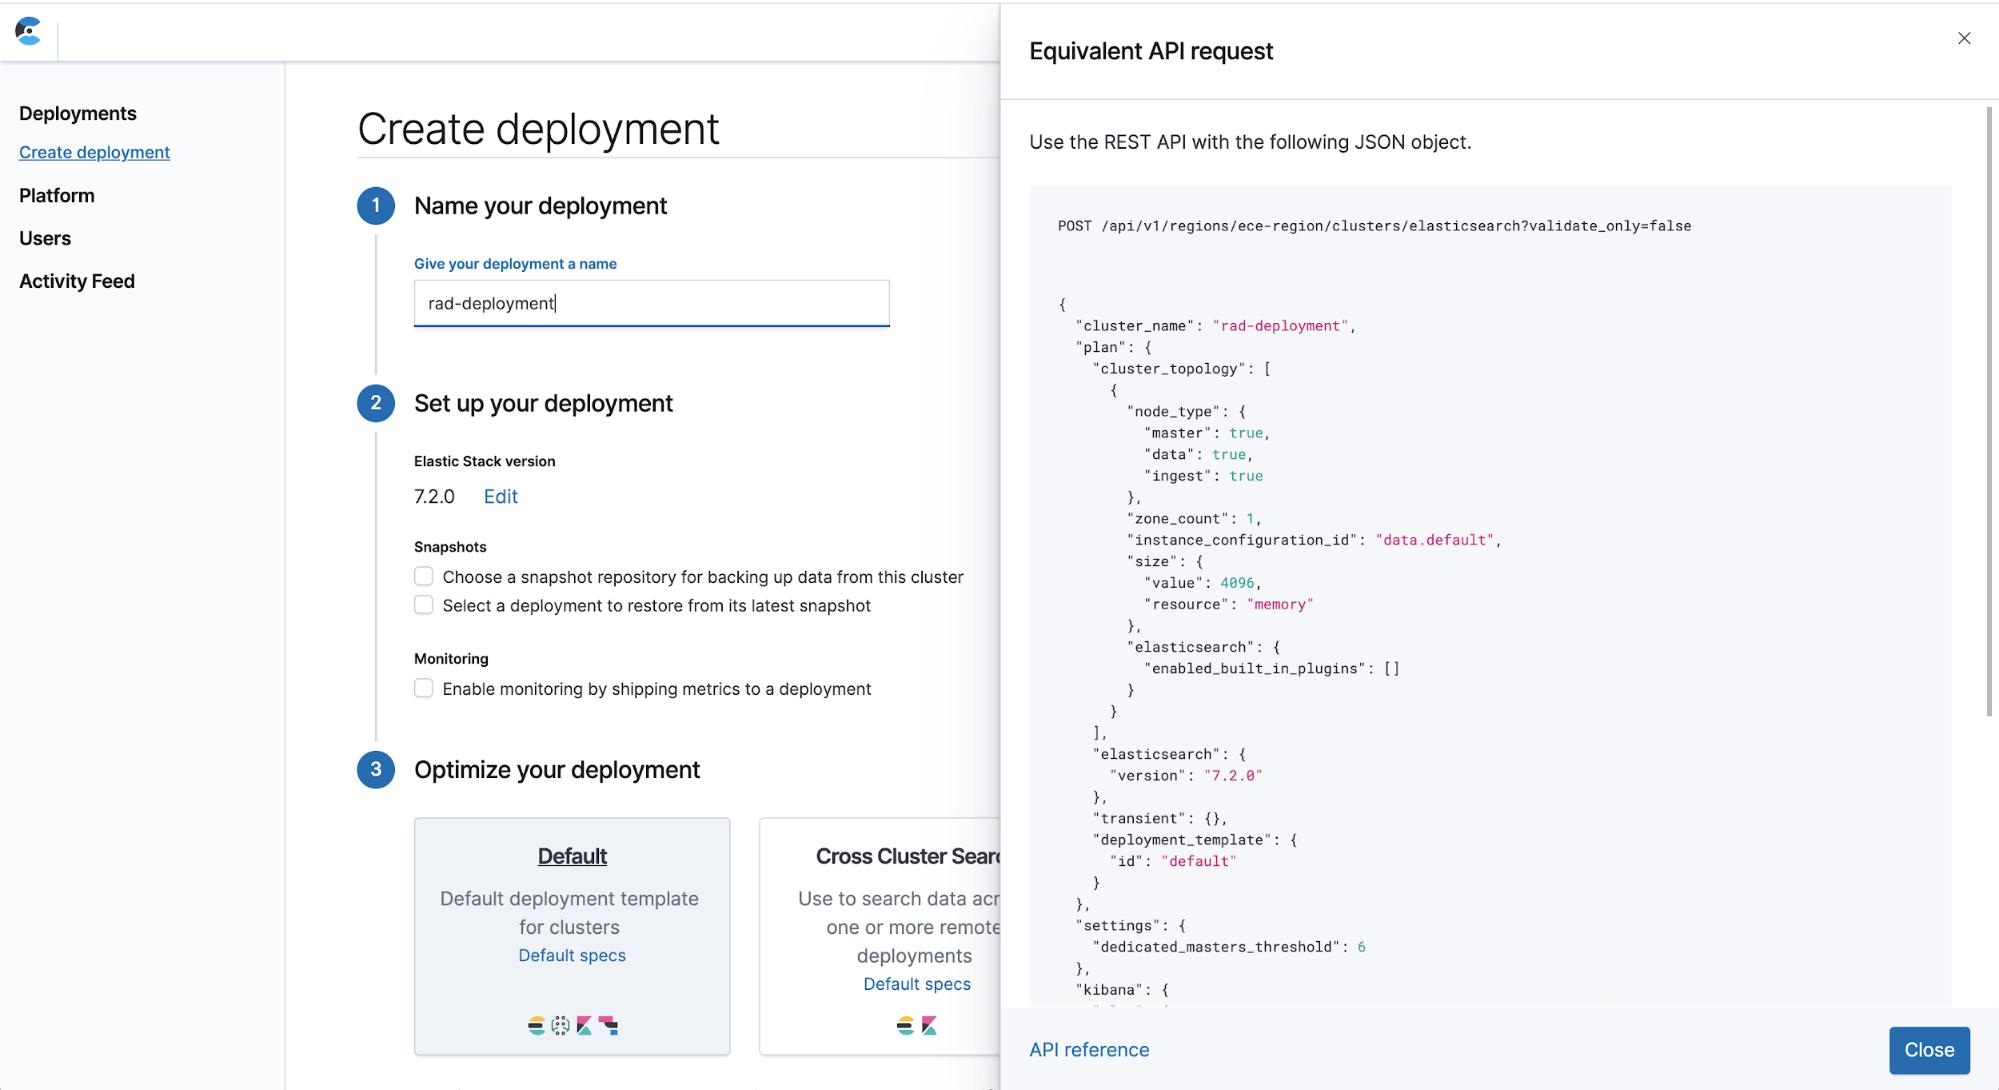 03_create-deployment-elastic-cloud-enterprise-2-3-0-elasticsearch-blog.png